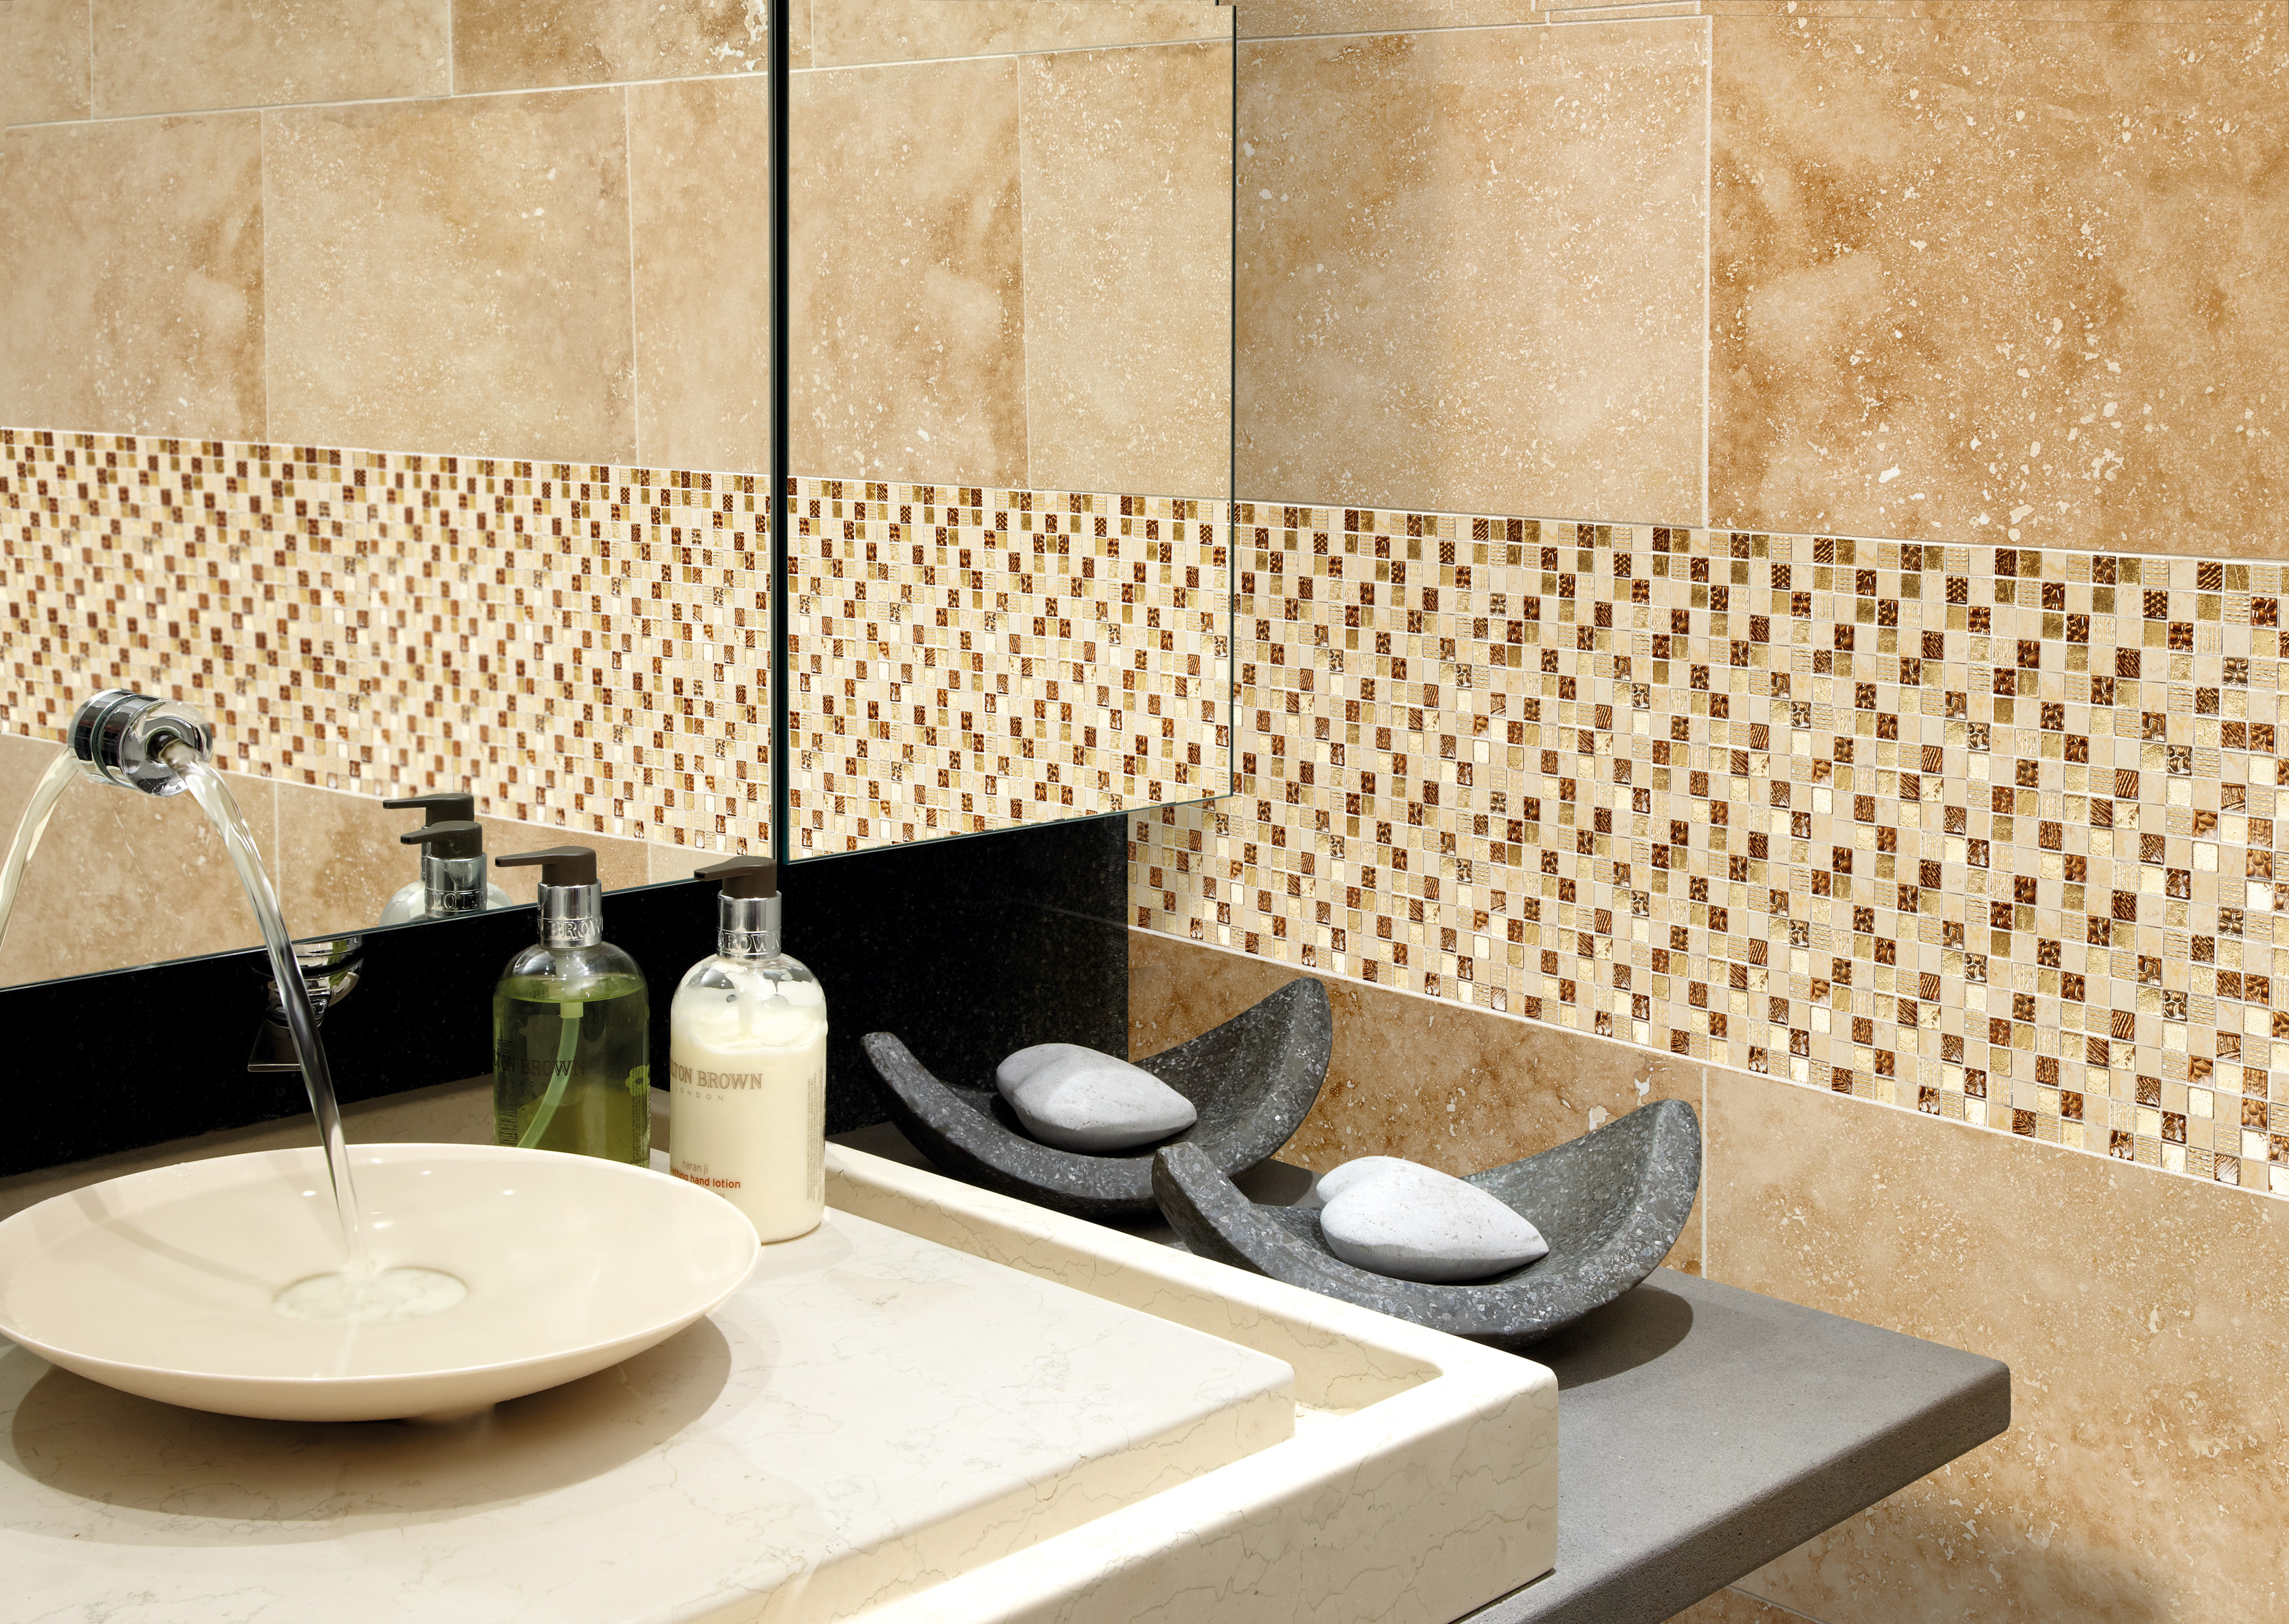 Bathroom Tiles Edinburgh - hamillstrosin.us